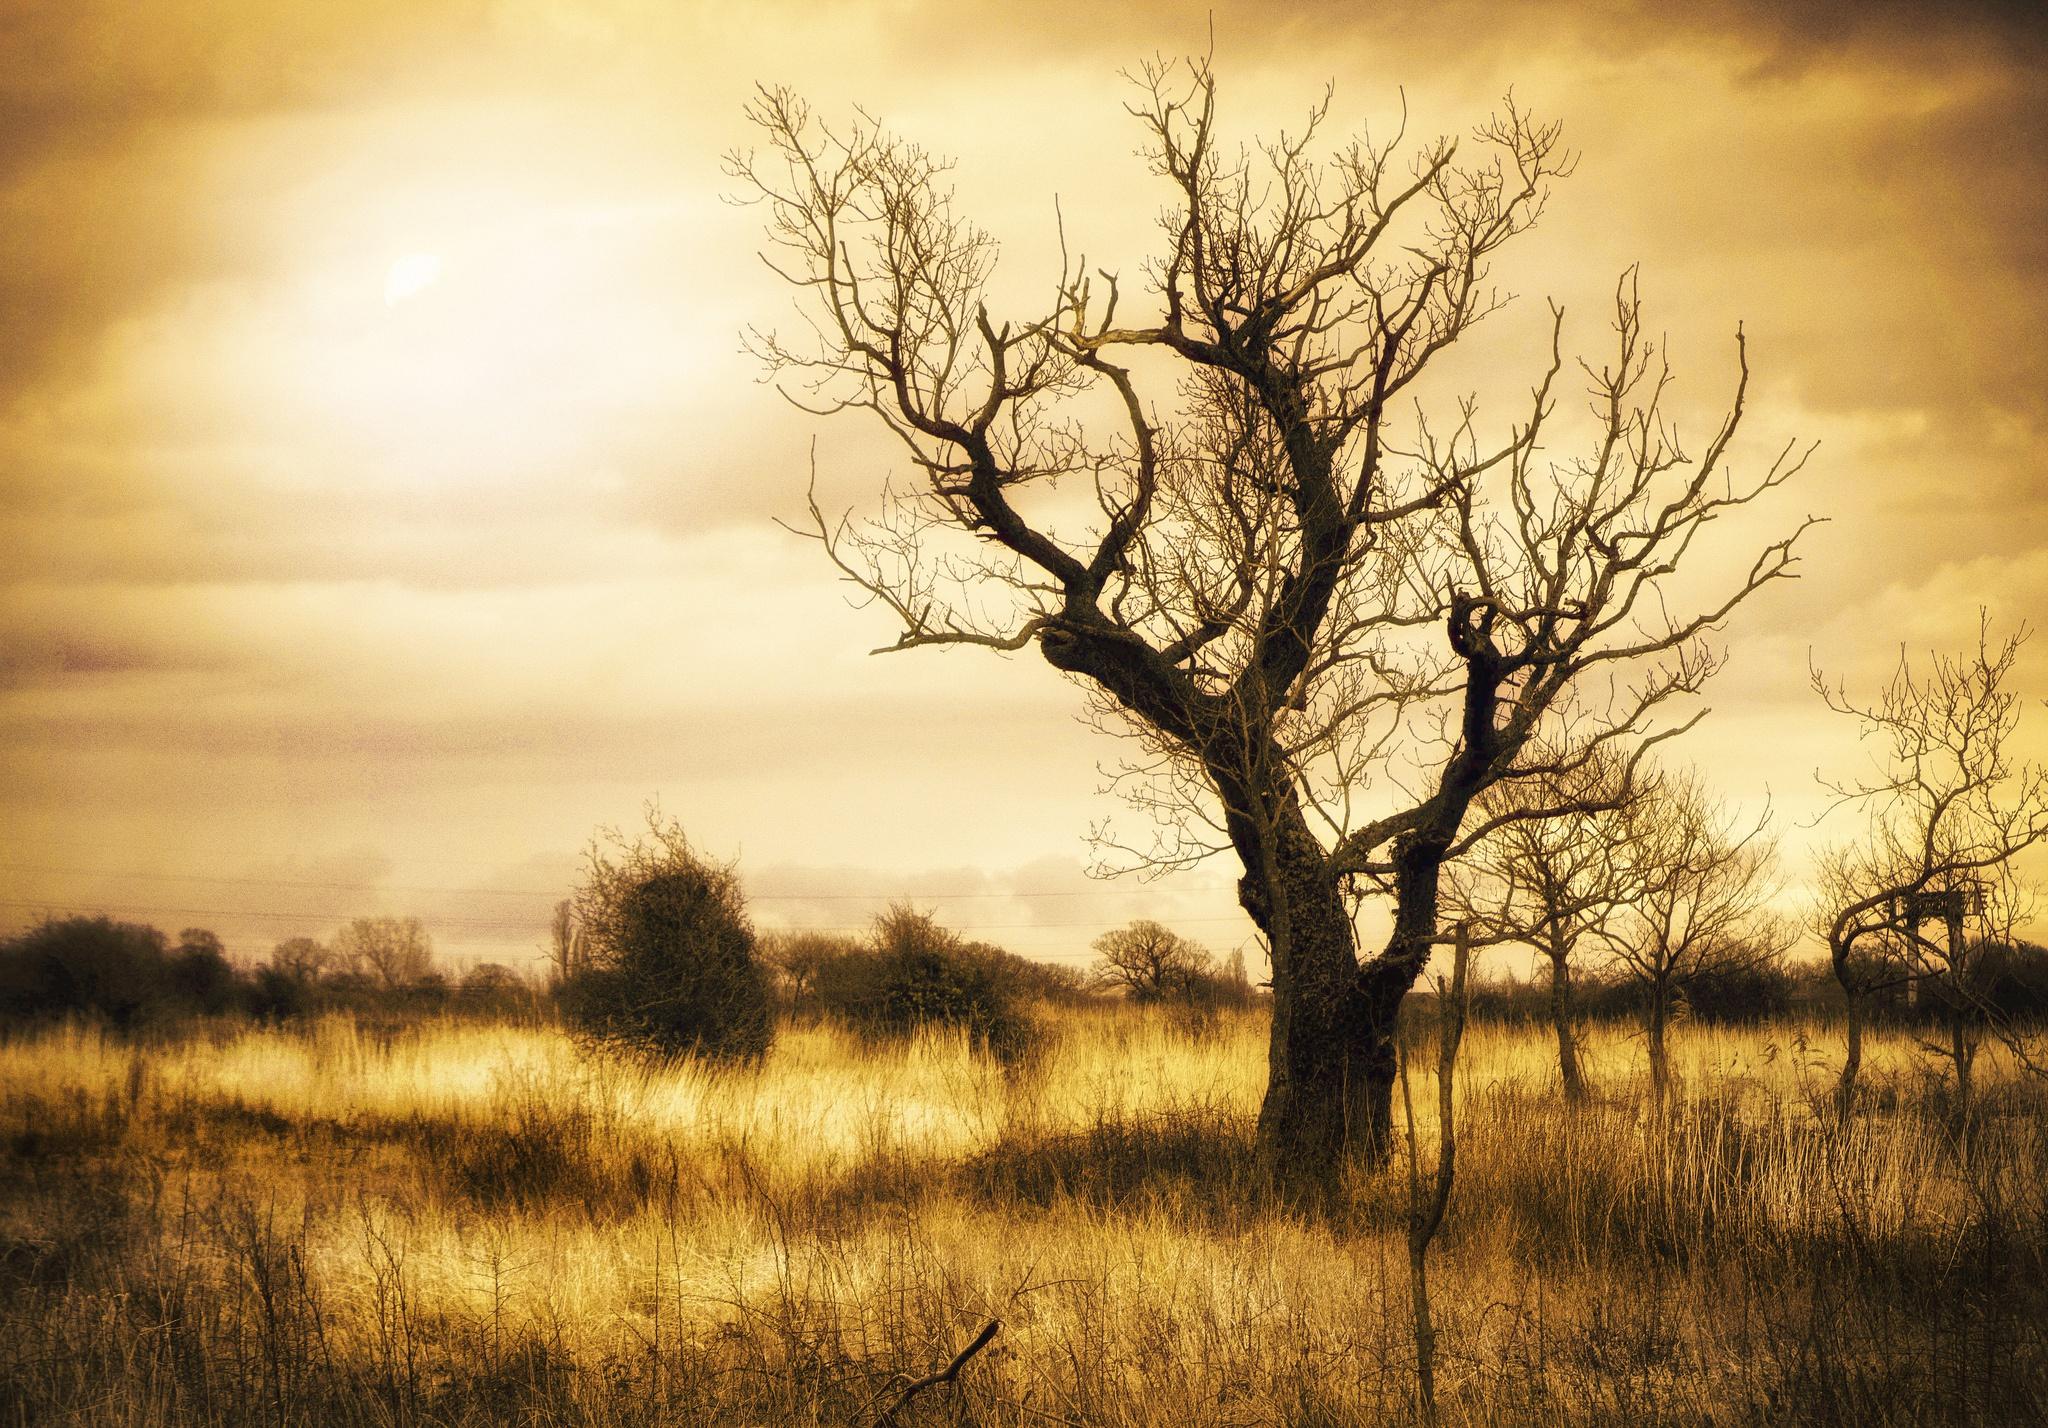 блондинка дерево поле blonde tree field  № 1377133 бесплатно